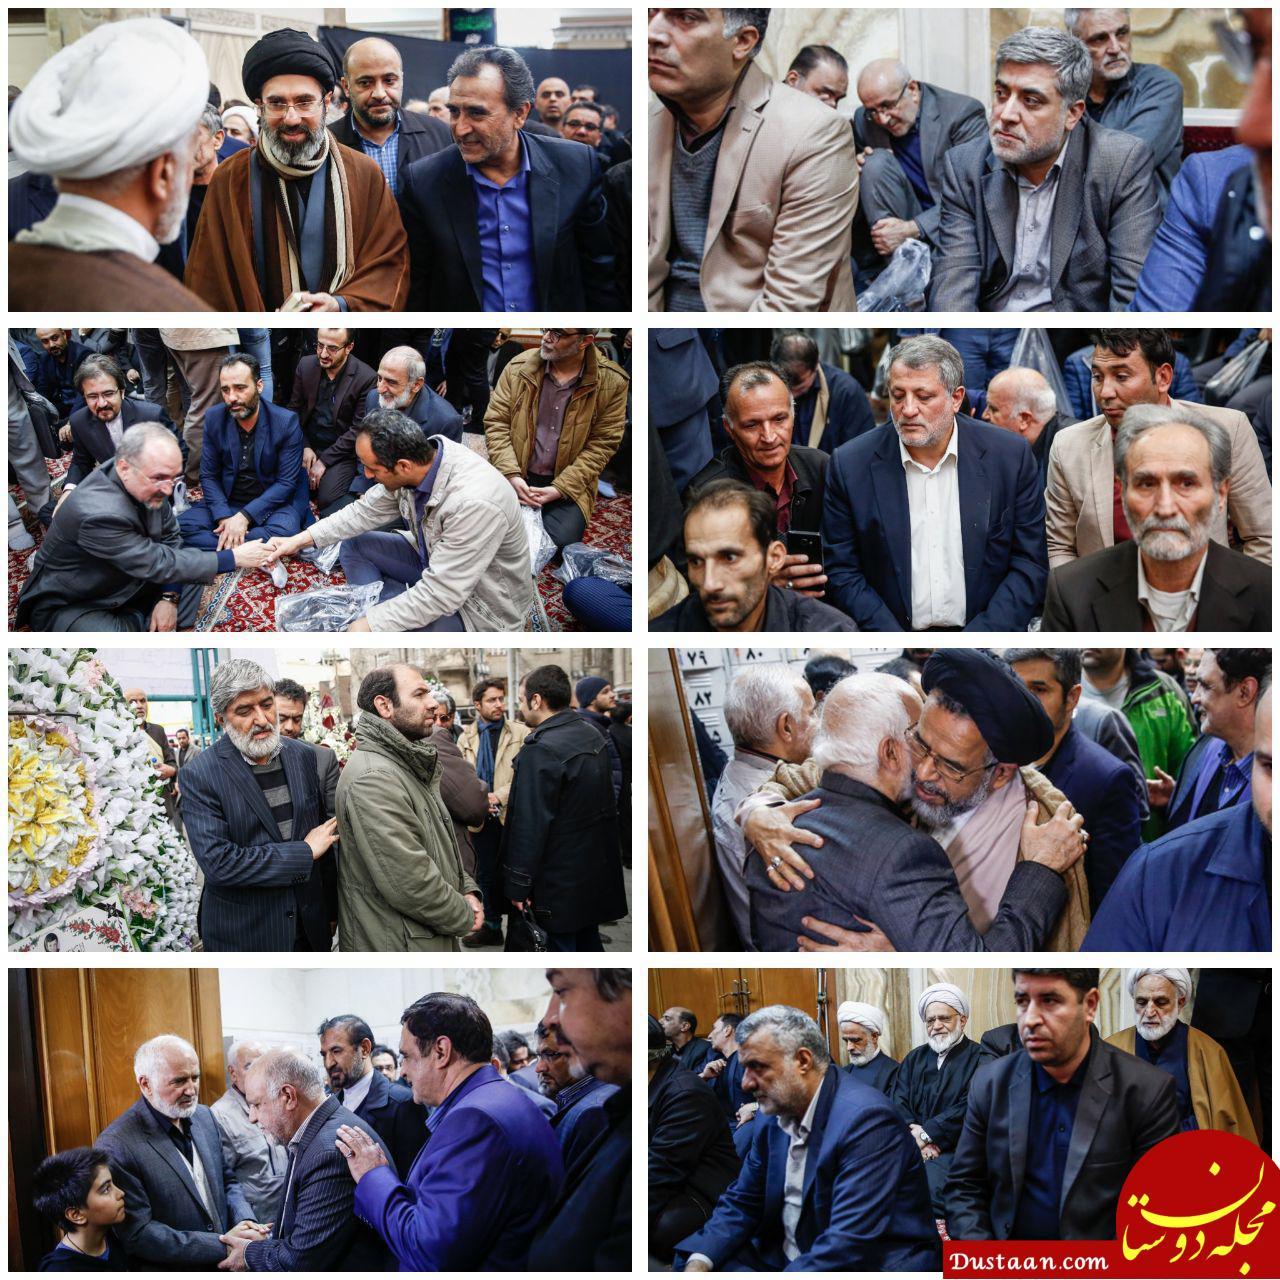 www.dustaan.com چهره های حاضر در مراسم ترحیم محمد توکلی +تصاویر